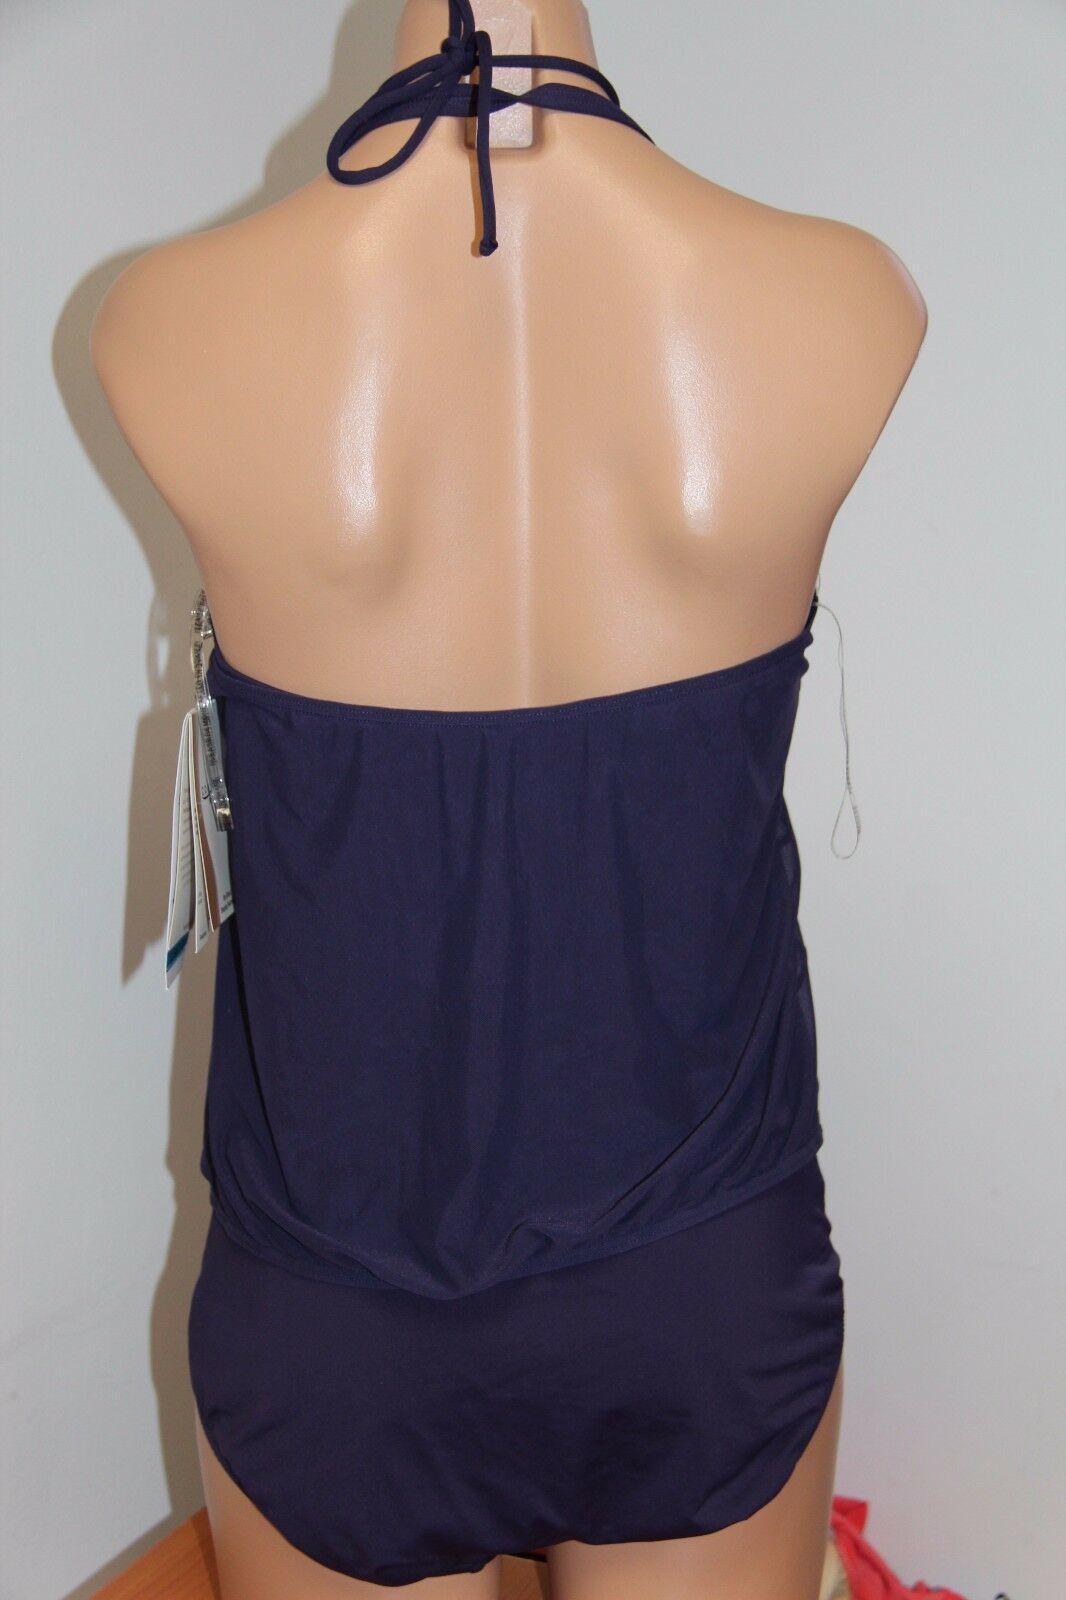 NWT Coco Reef Swimsuit Bikini 1 one  piece Sz 12 36D Deep Amethyst